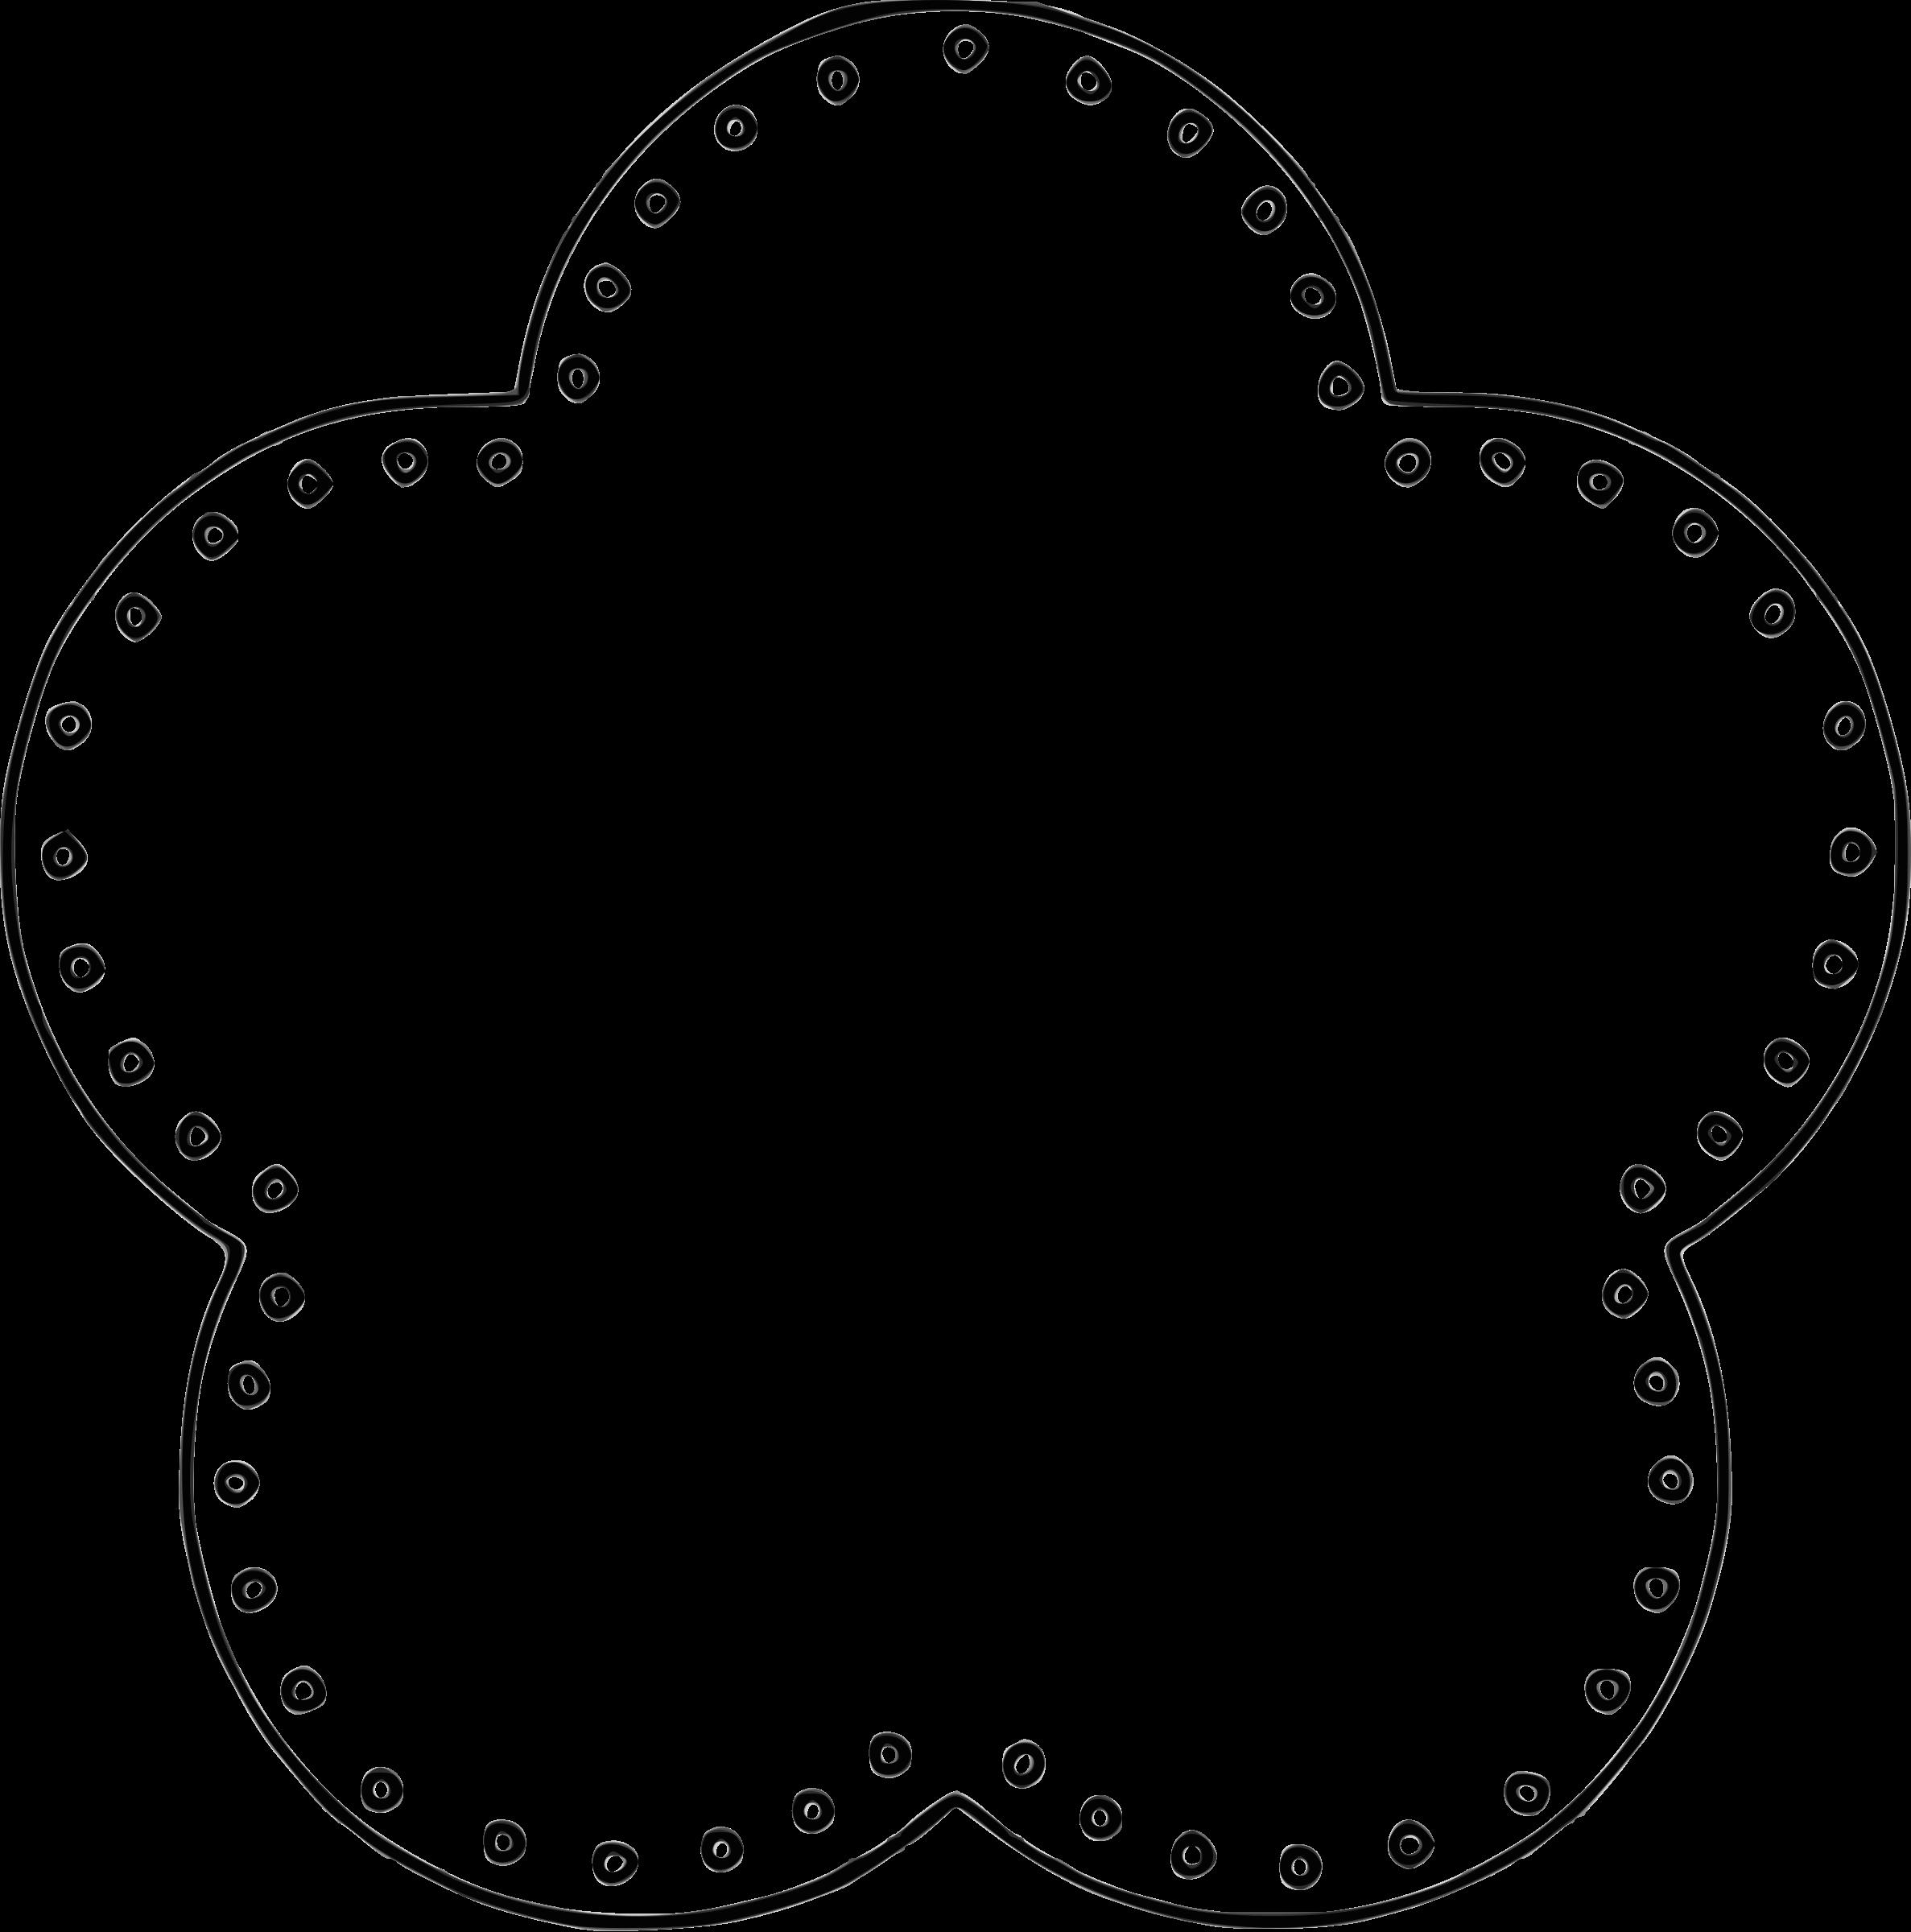 2374x2400 Circle Scalloped Border Clip Art Image